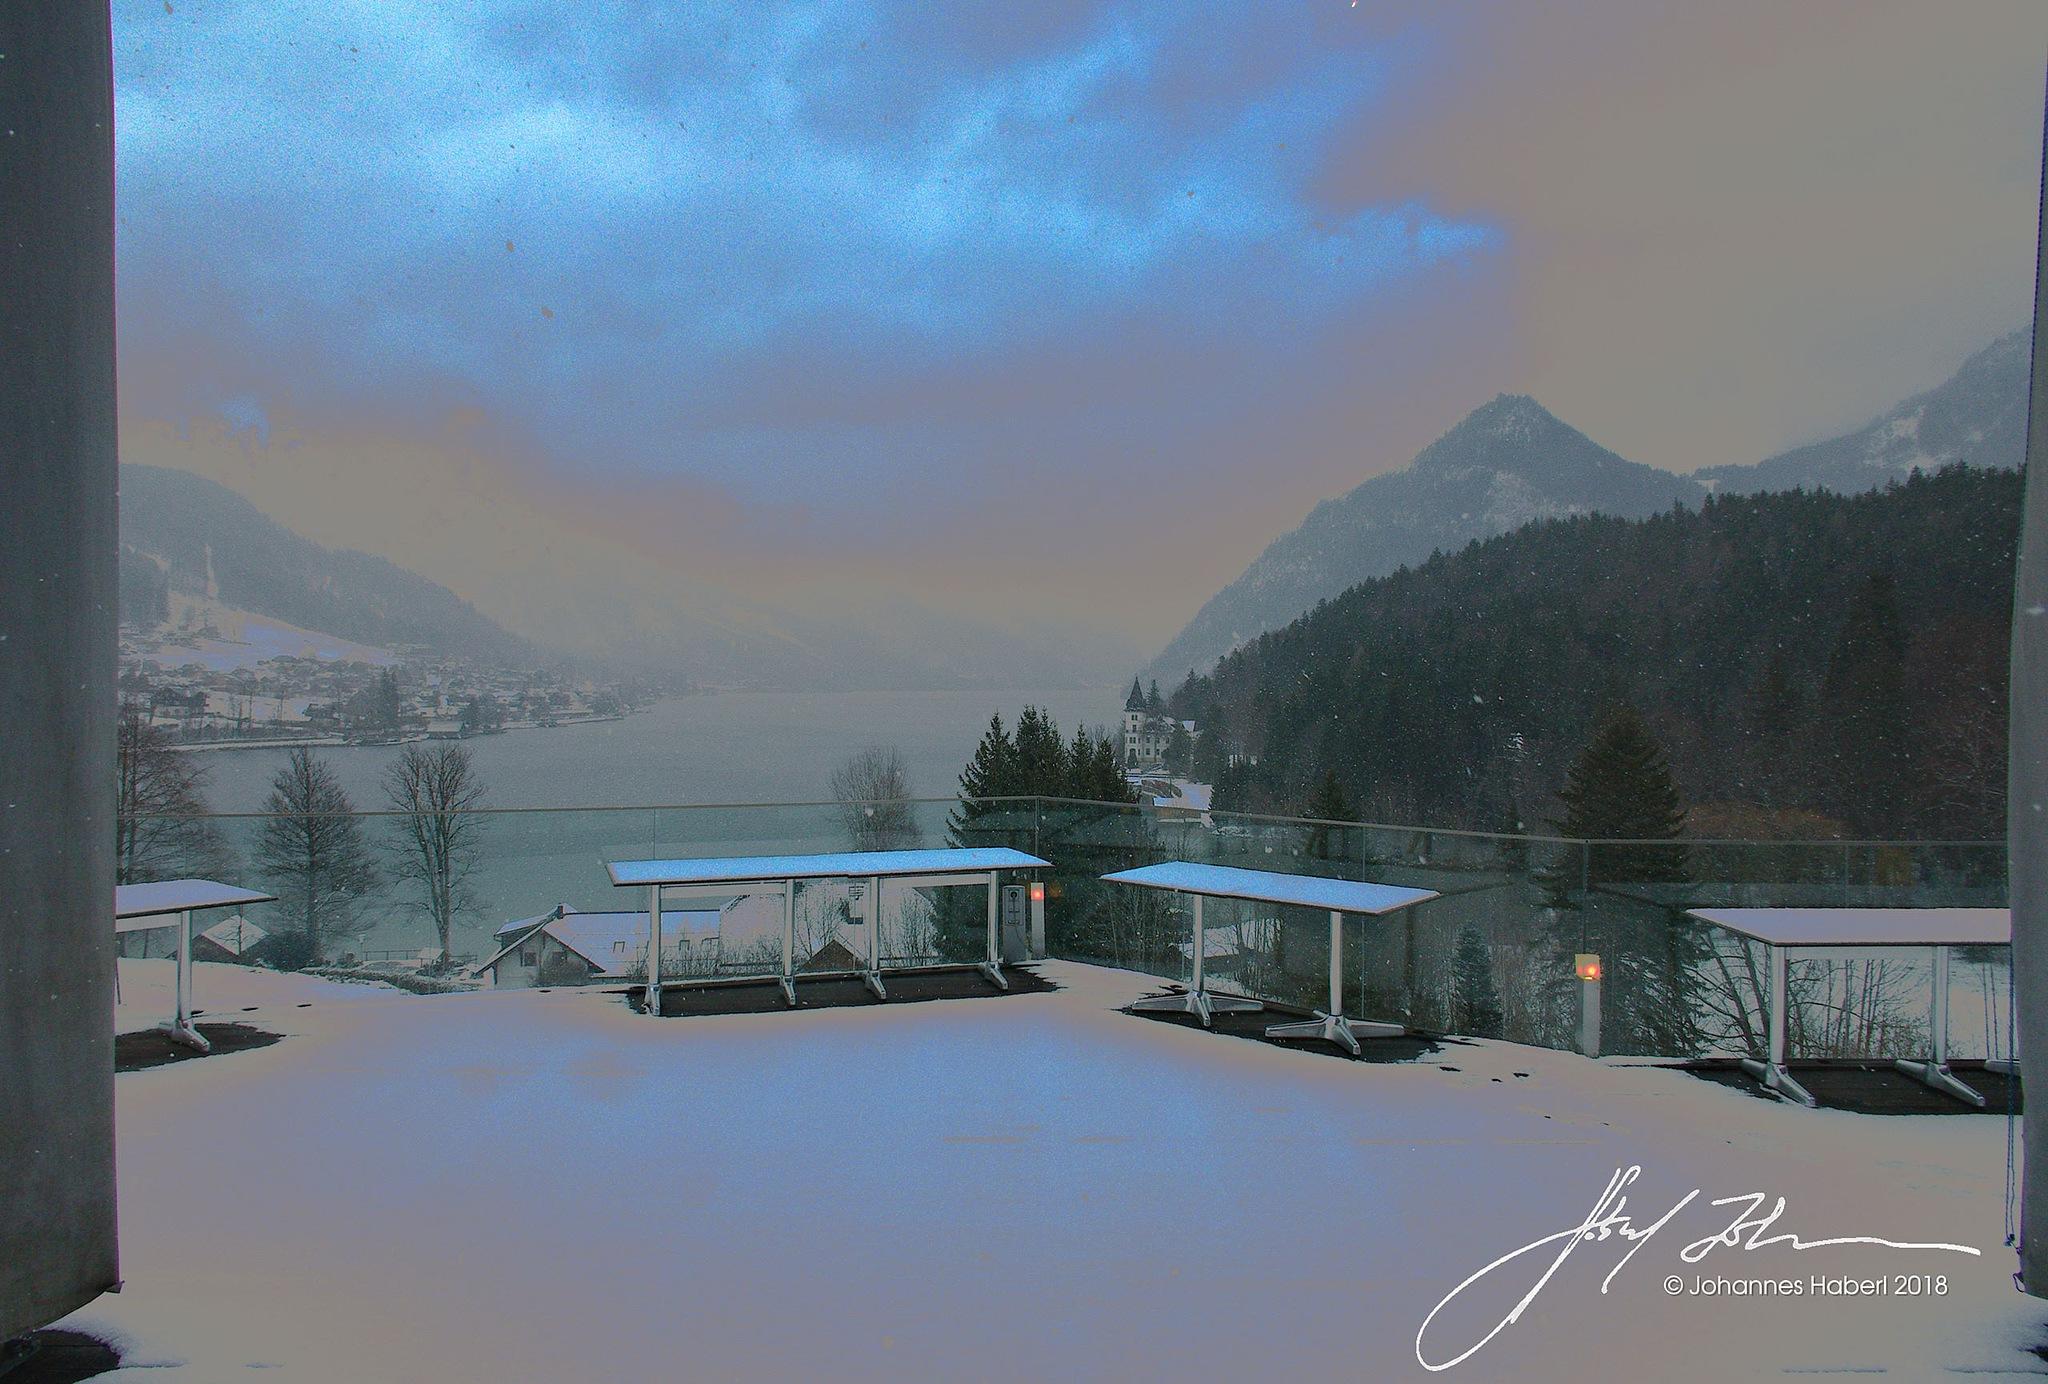 fresh snow falling on Grundlsee / Version II by Johannes Haberl